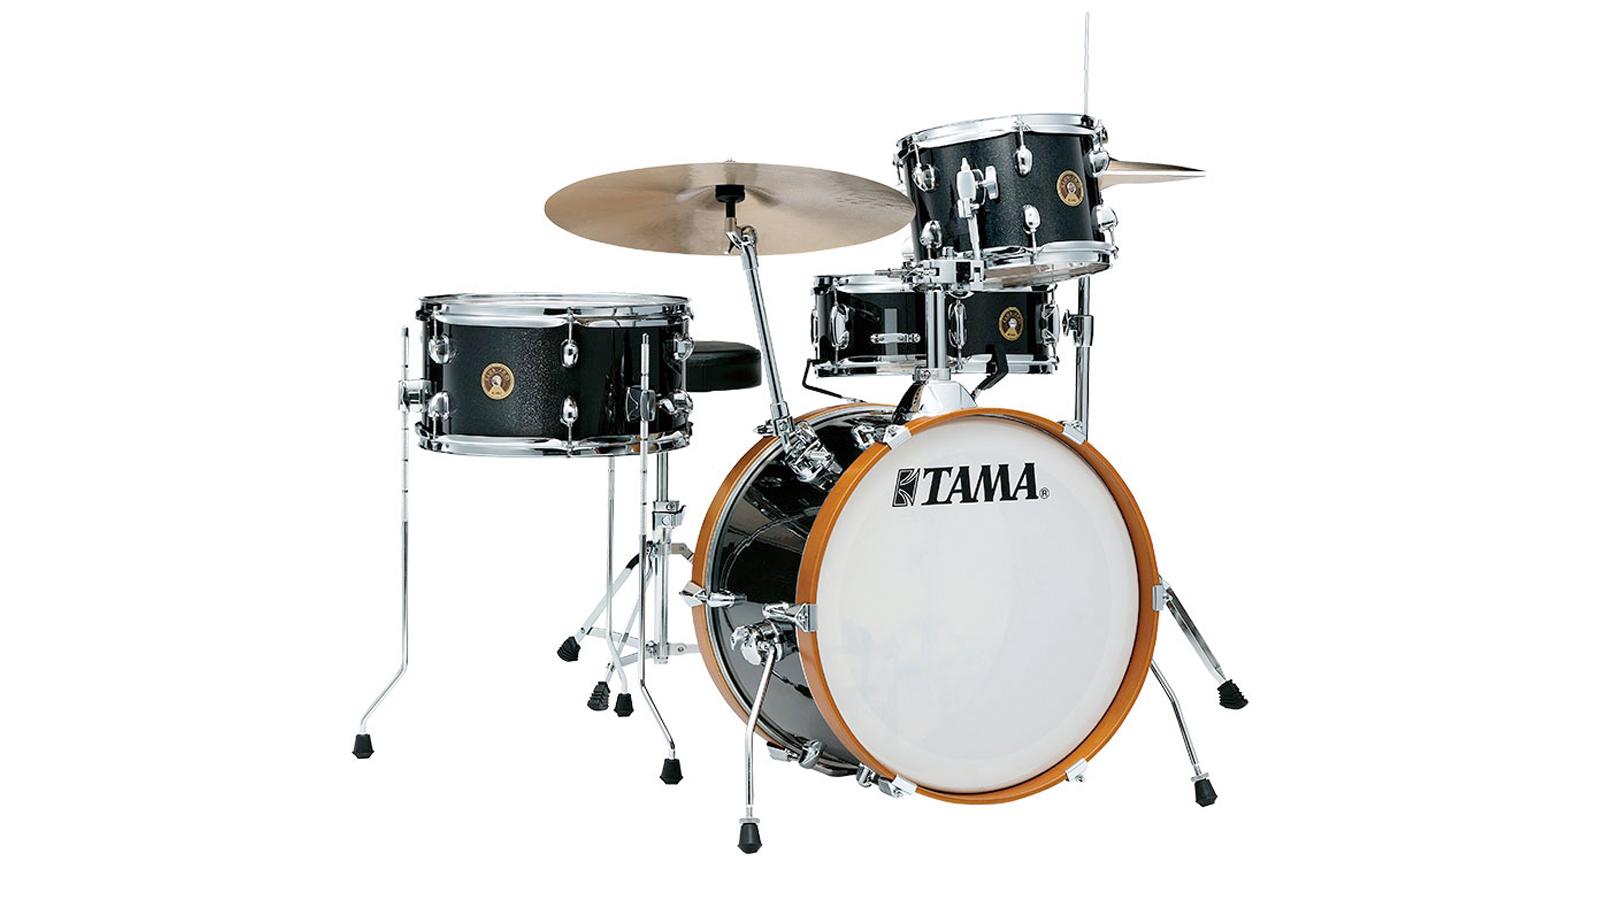 Tama LJK48S-CCM CLUB JAM Drumset Charcoal Mist